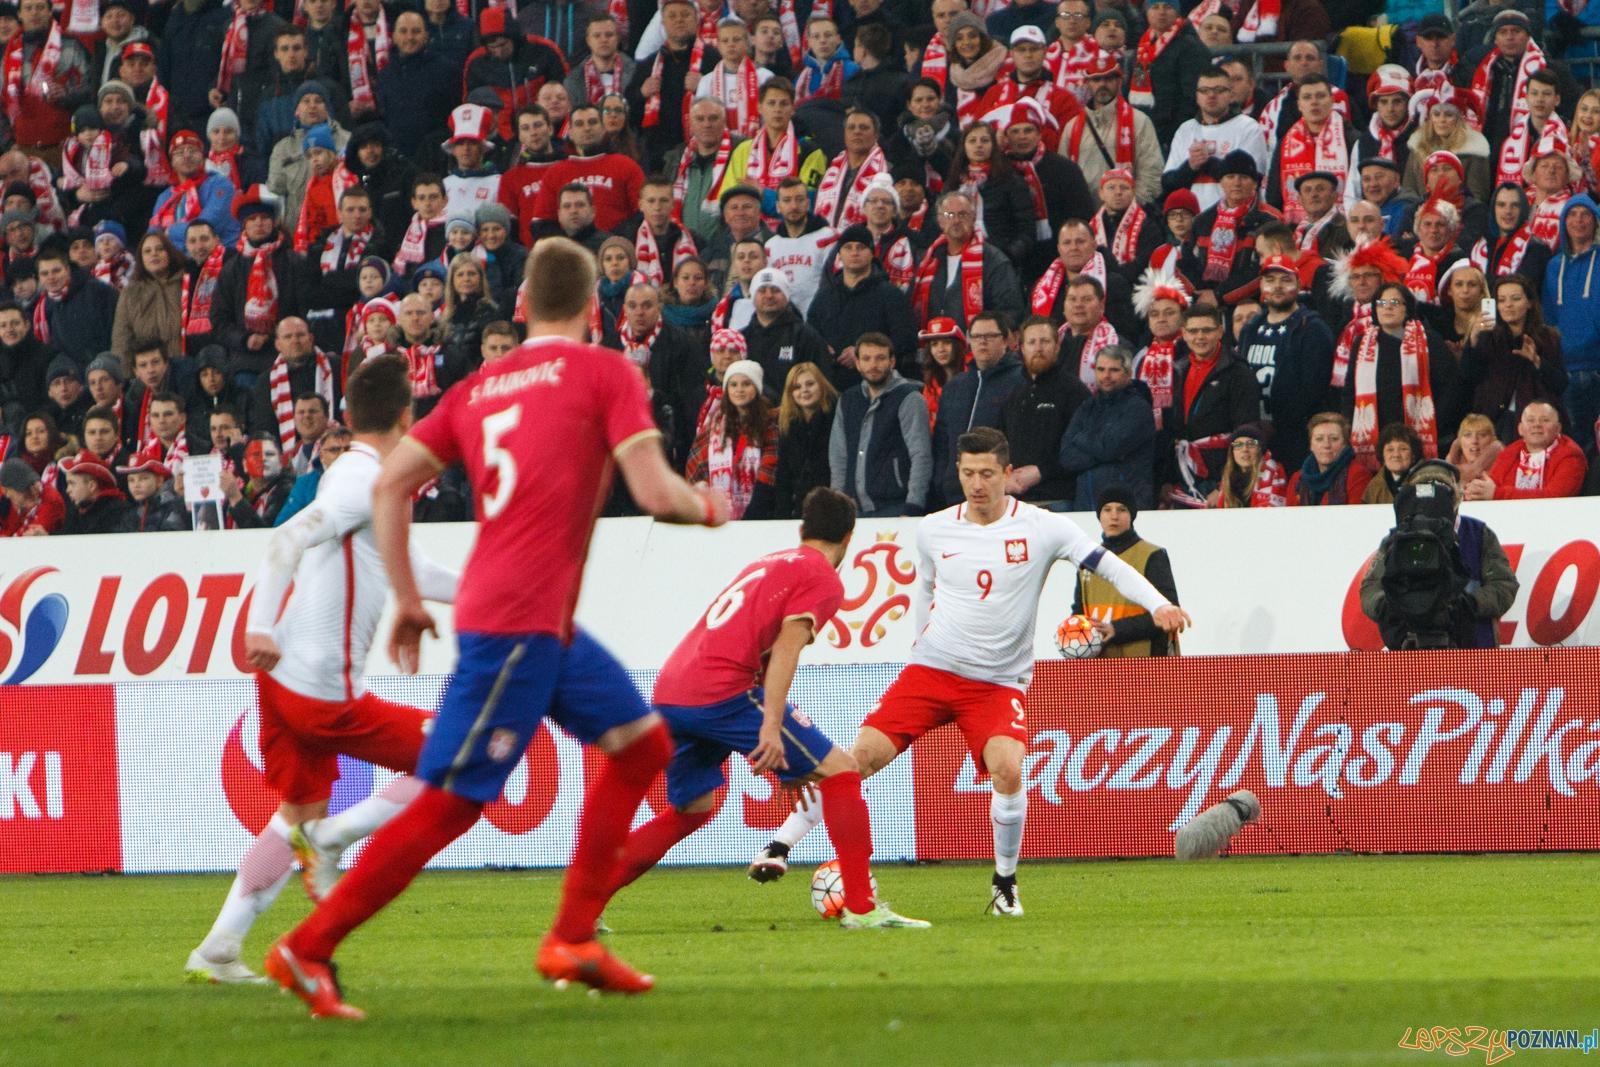 mecz polska serbia poznan search results summary daily